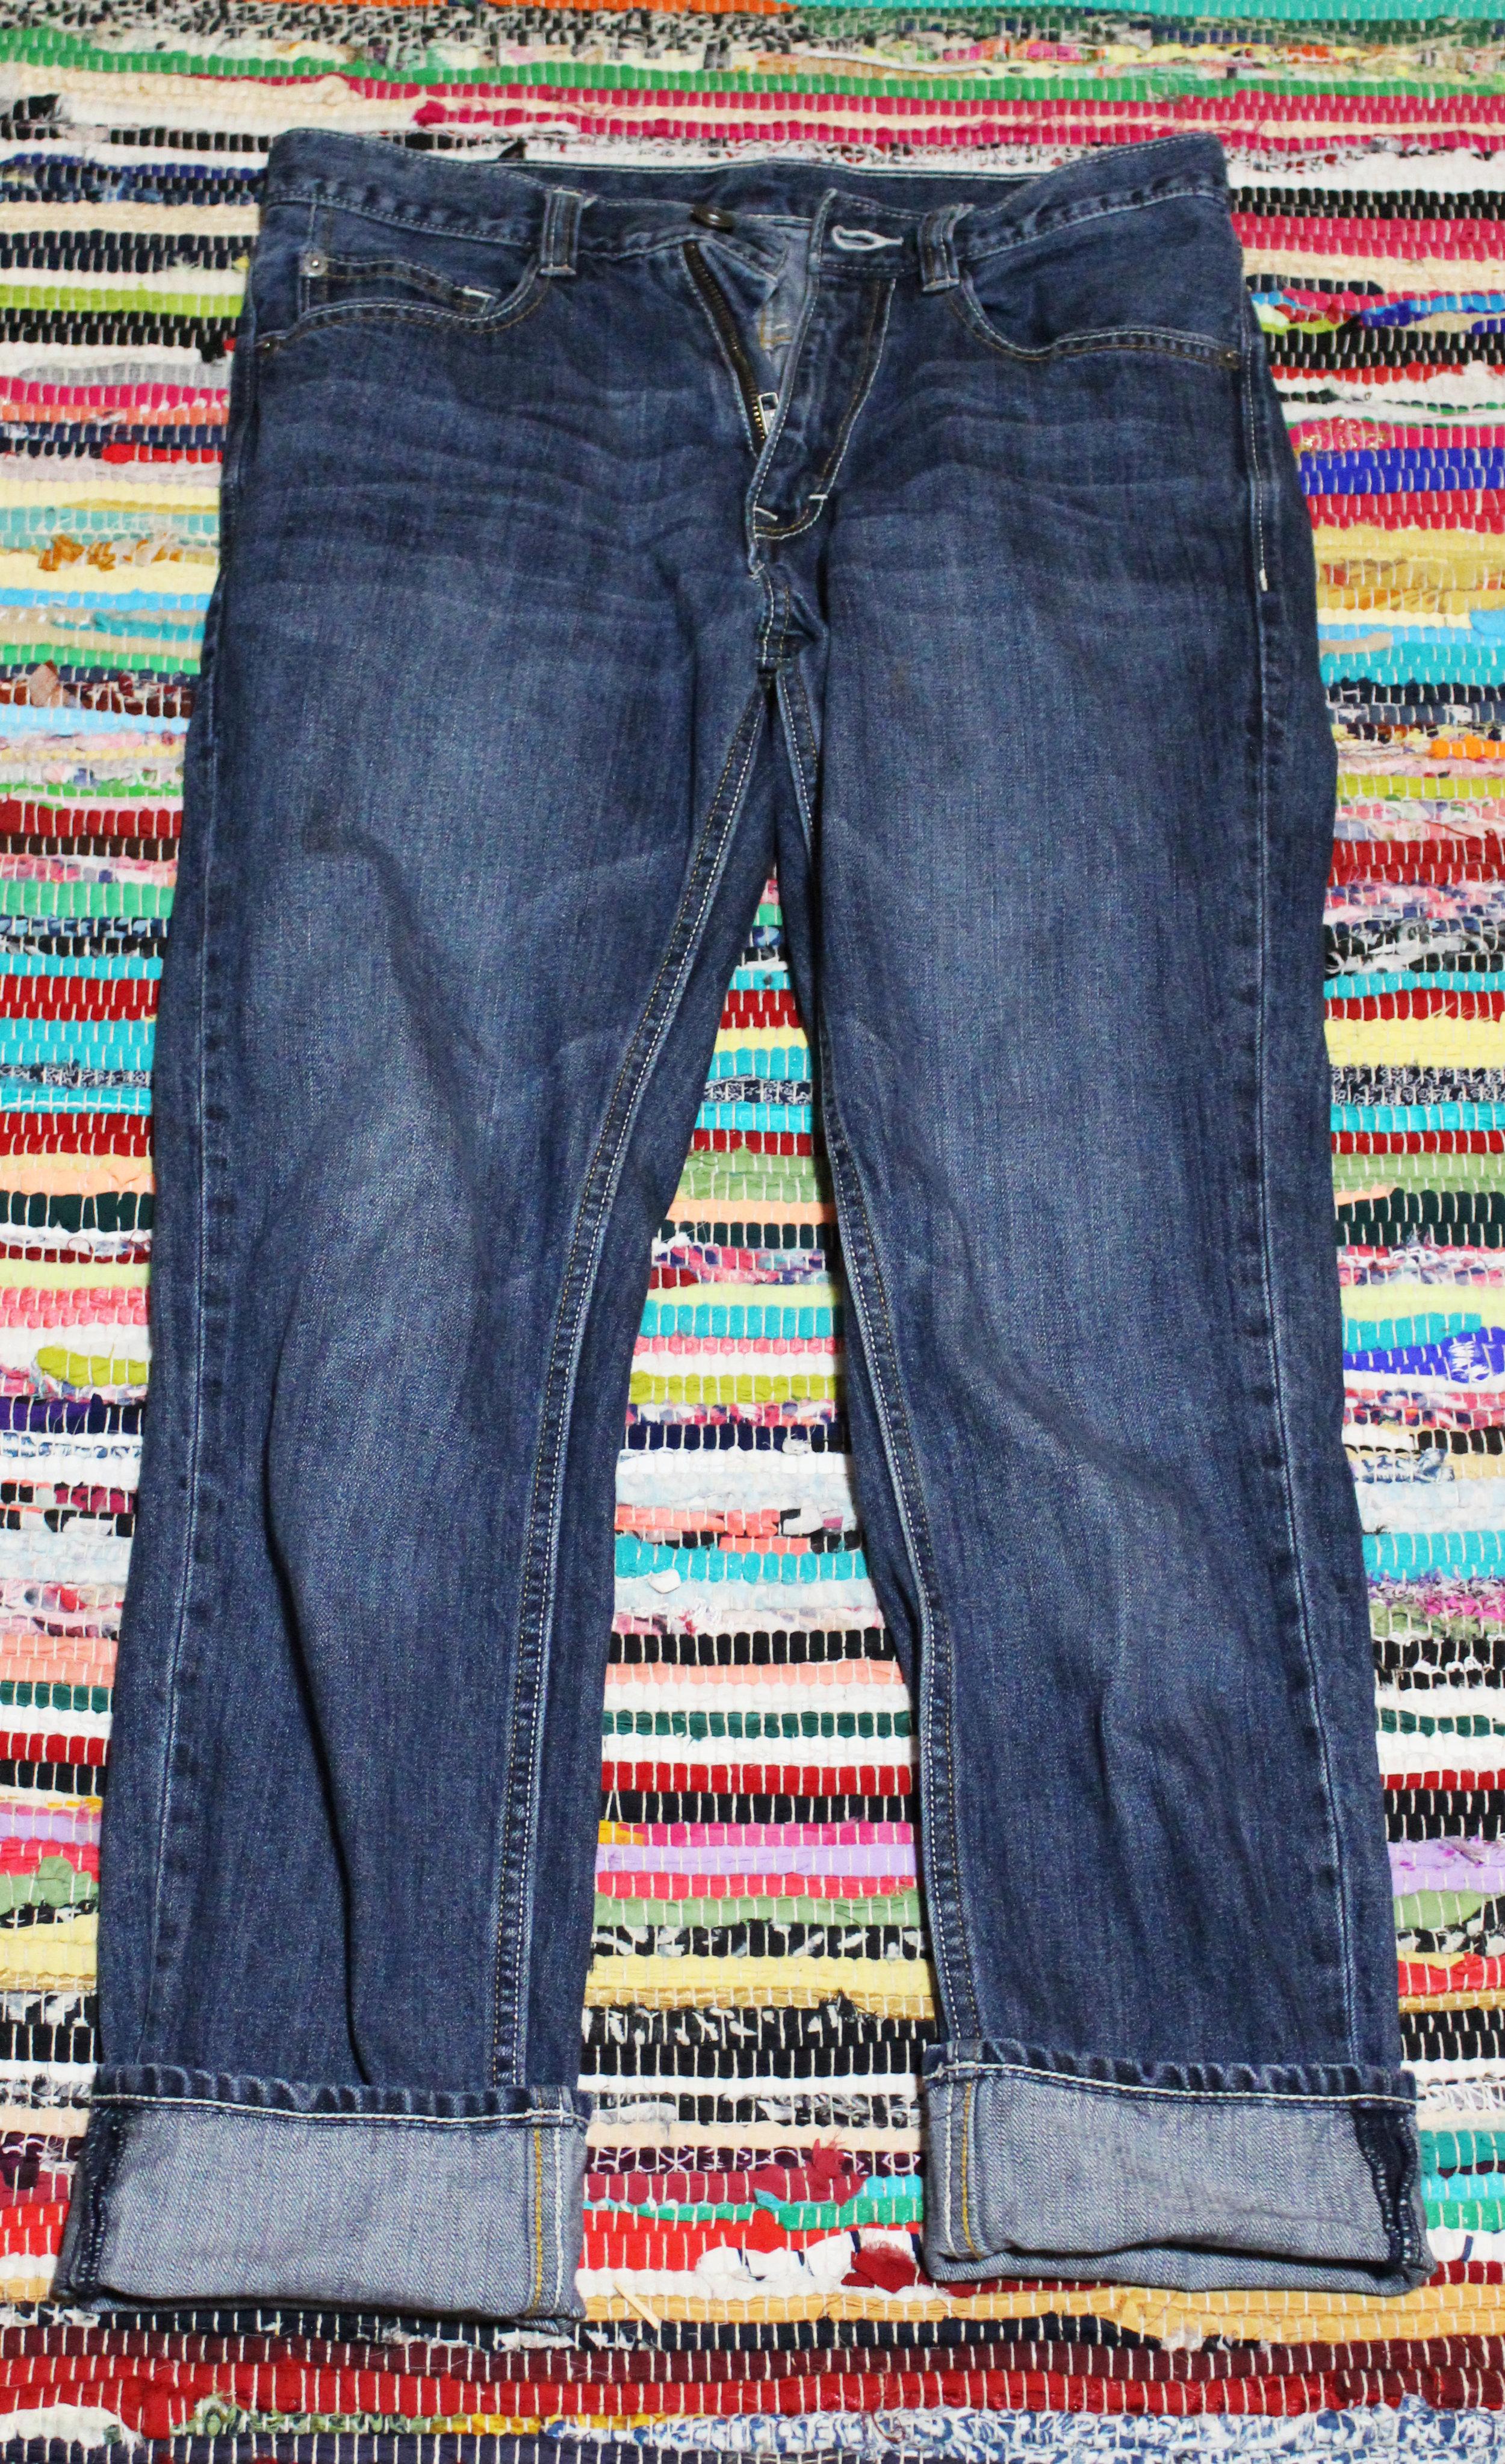 jeans potential star magnolias